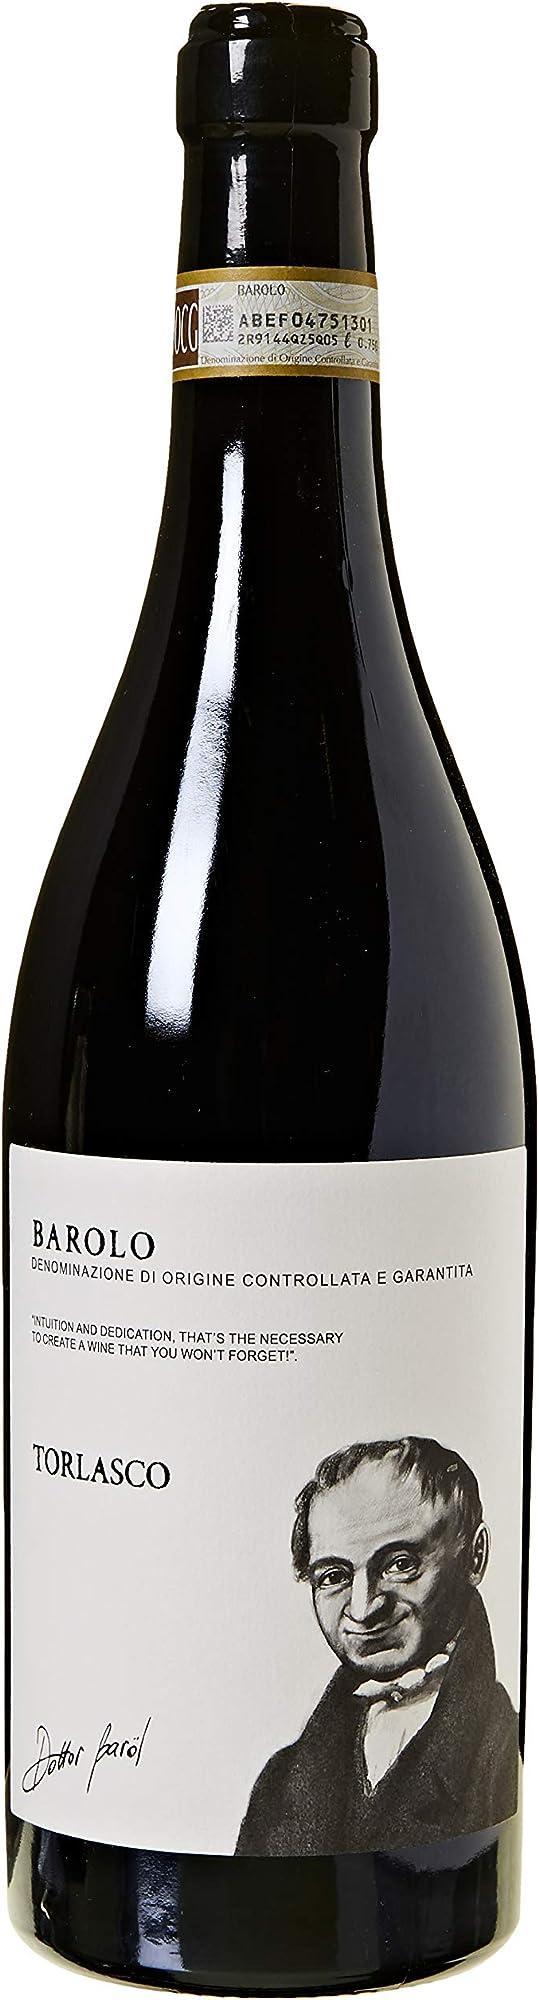 Torlasco, vino barolo docg rosso 8034042810756